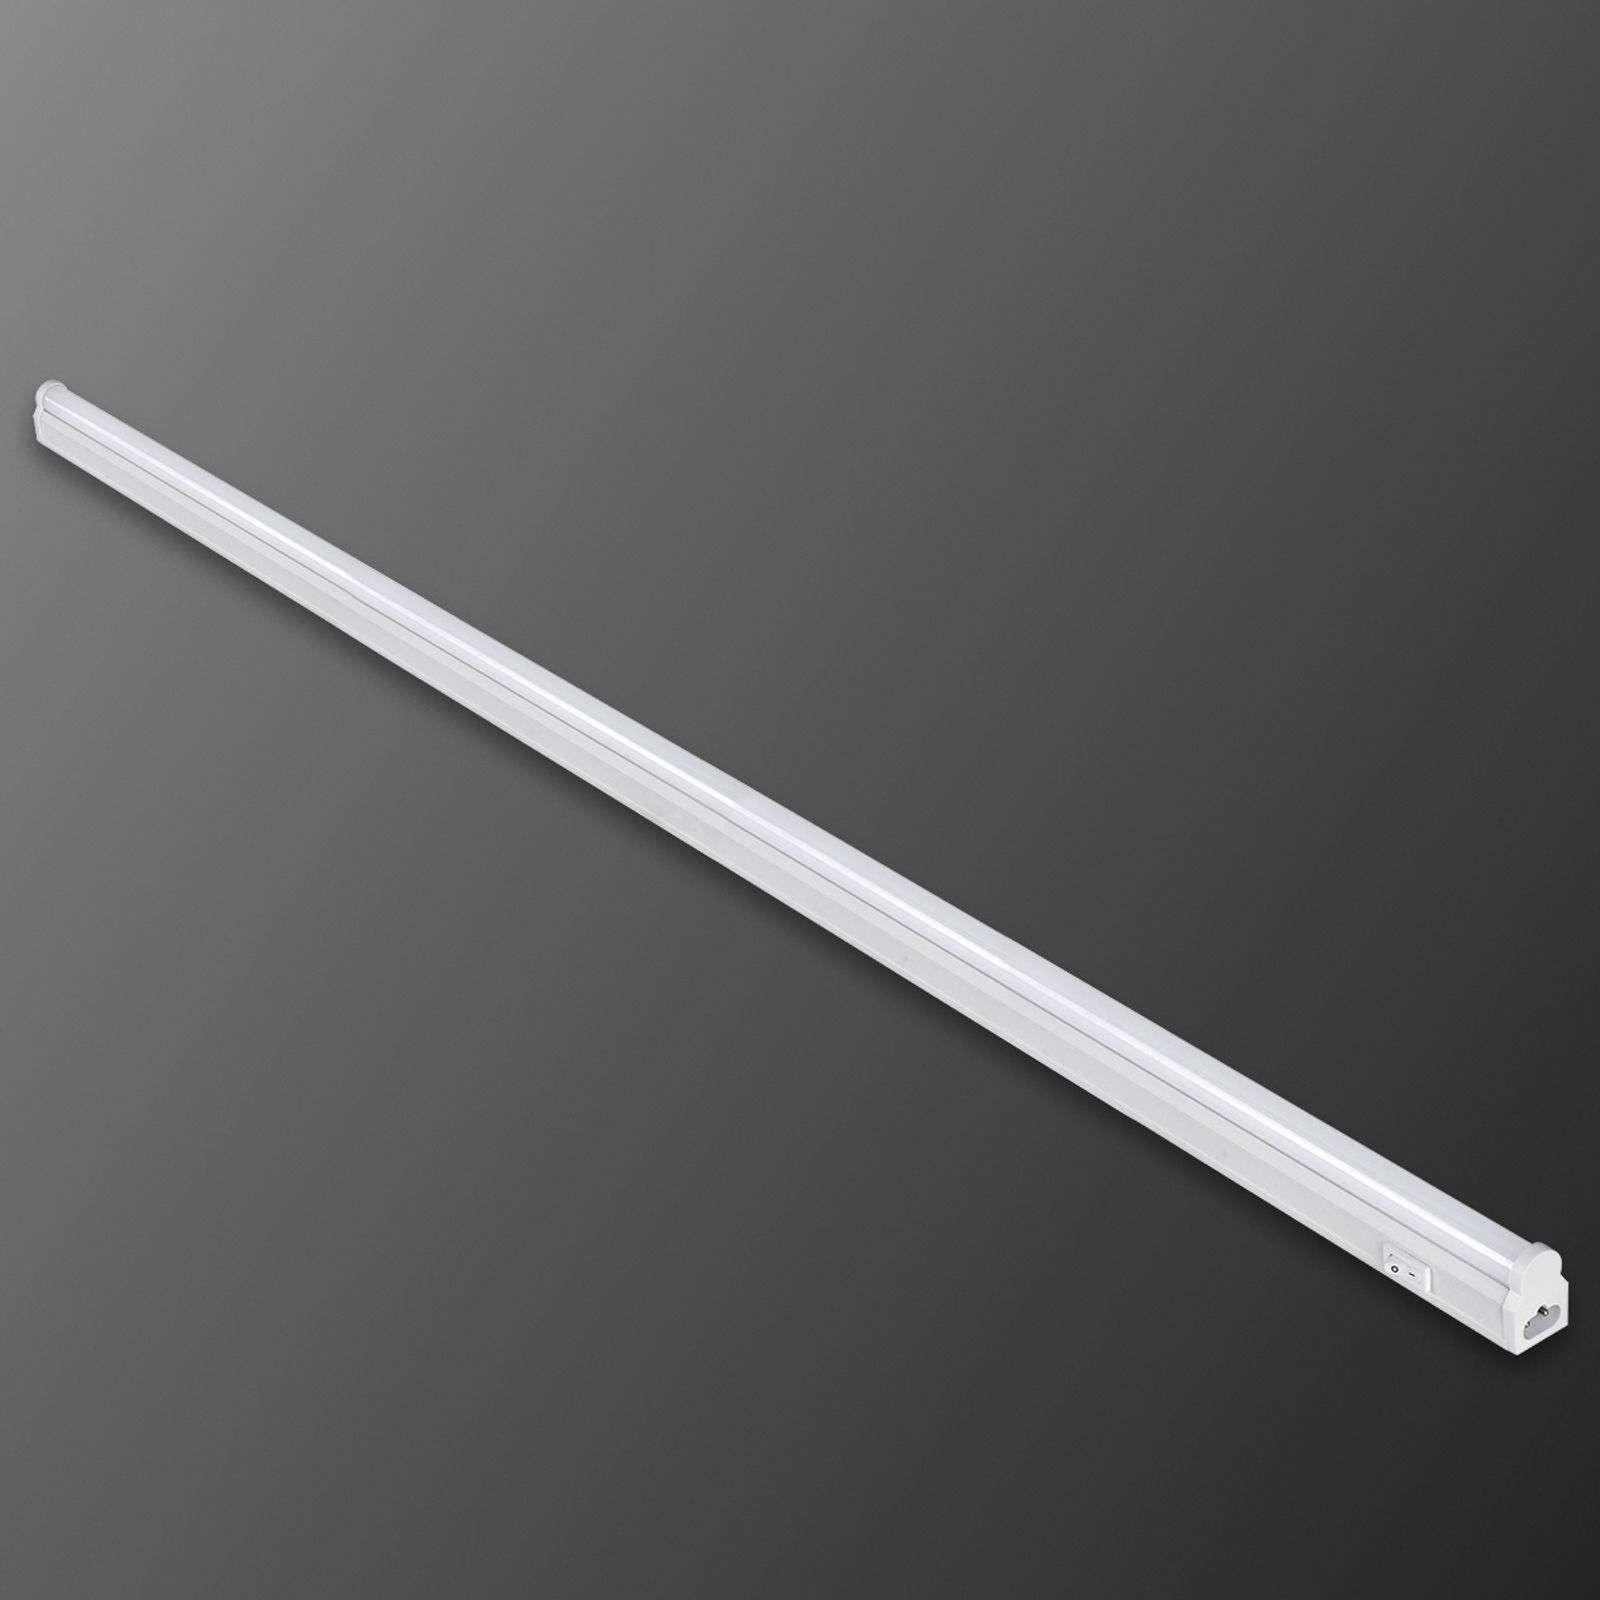 IBV lampada da incasso Power-LED 982, 16,2W, 147,5cm